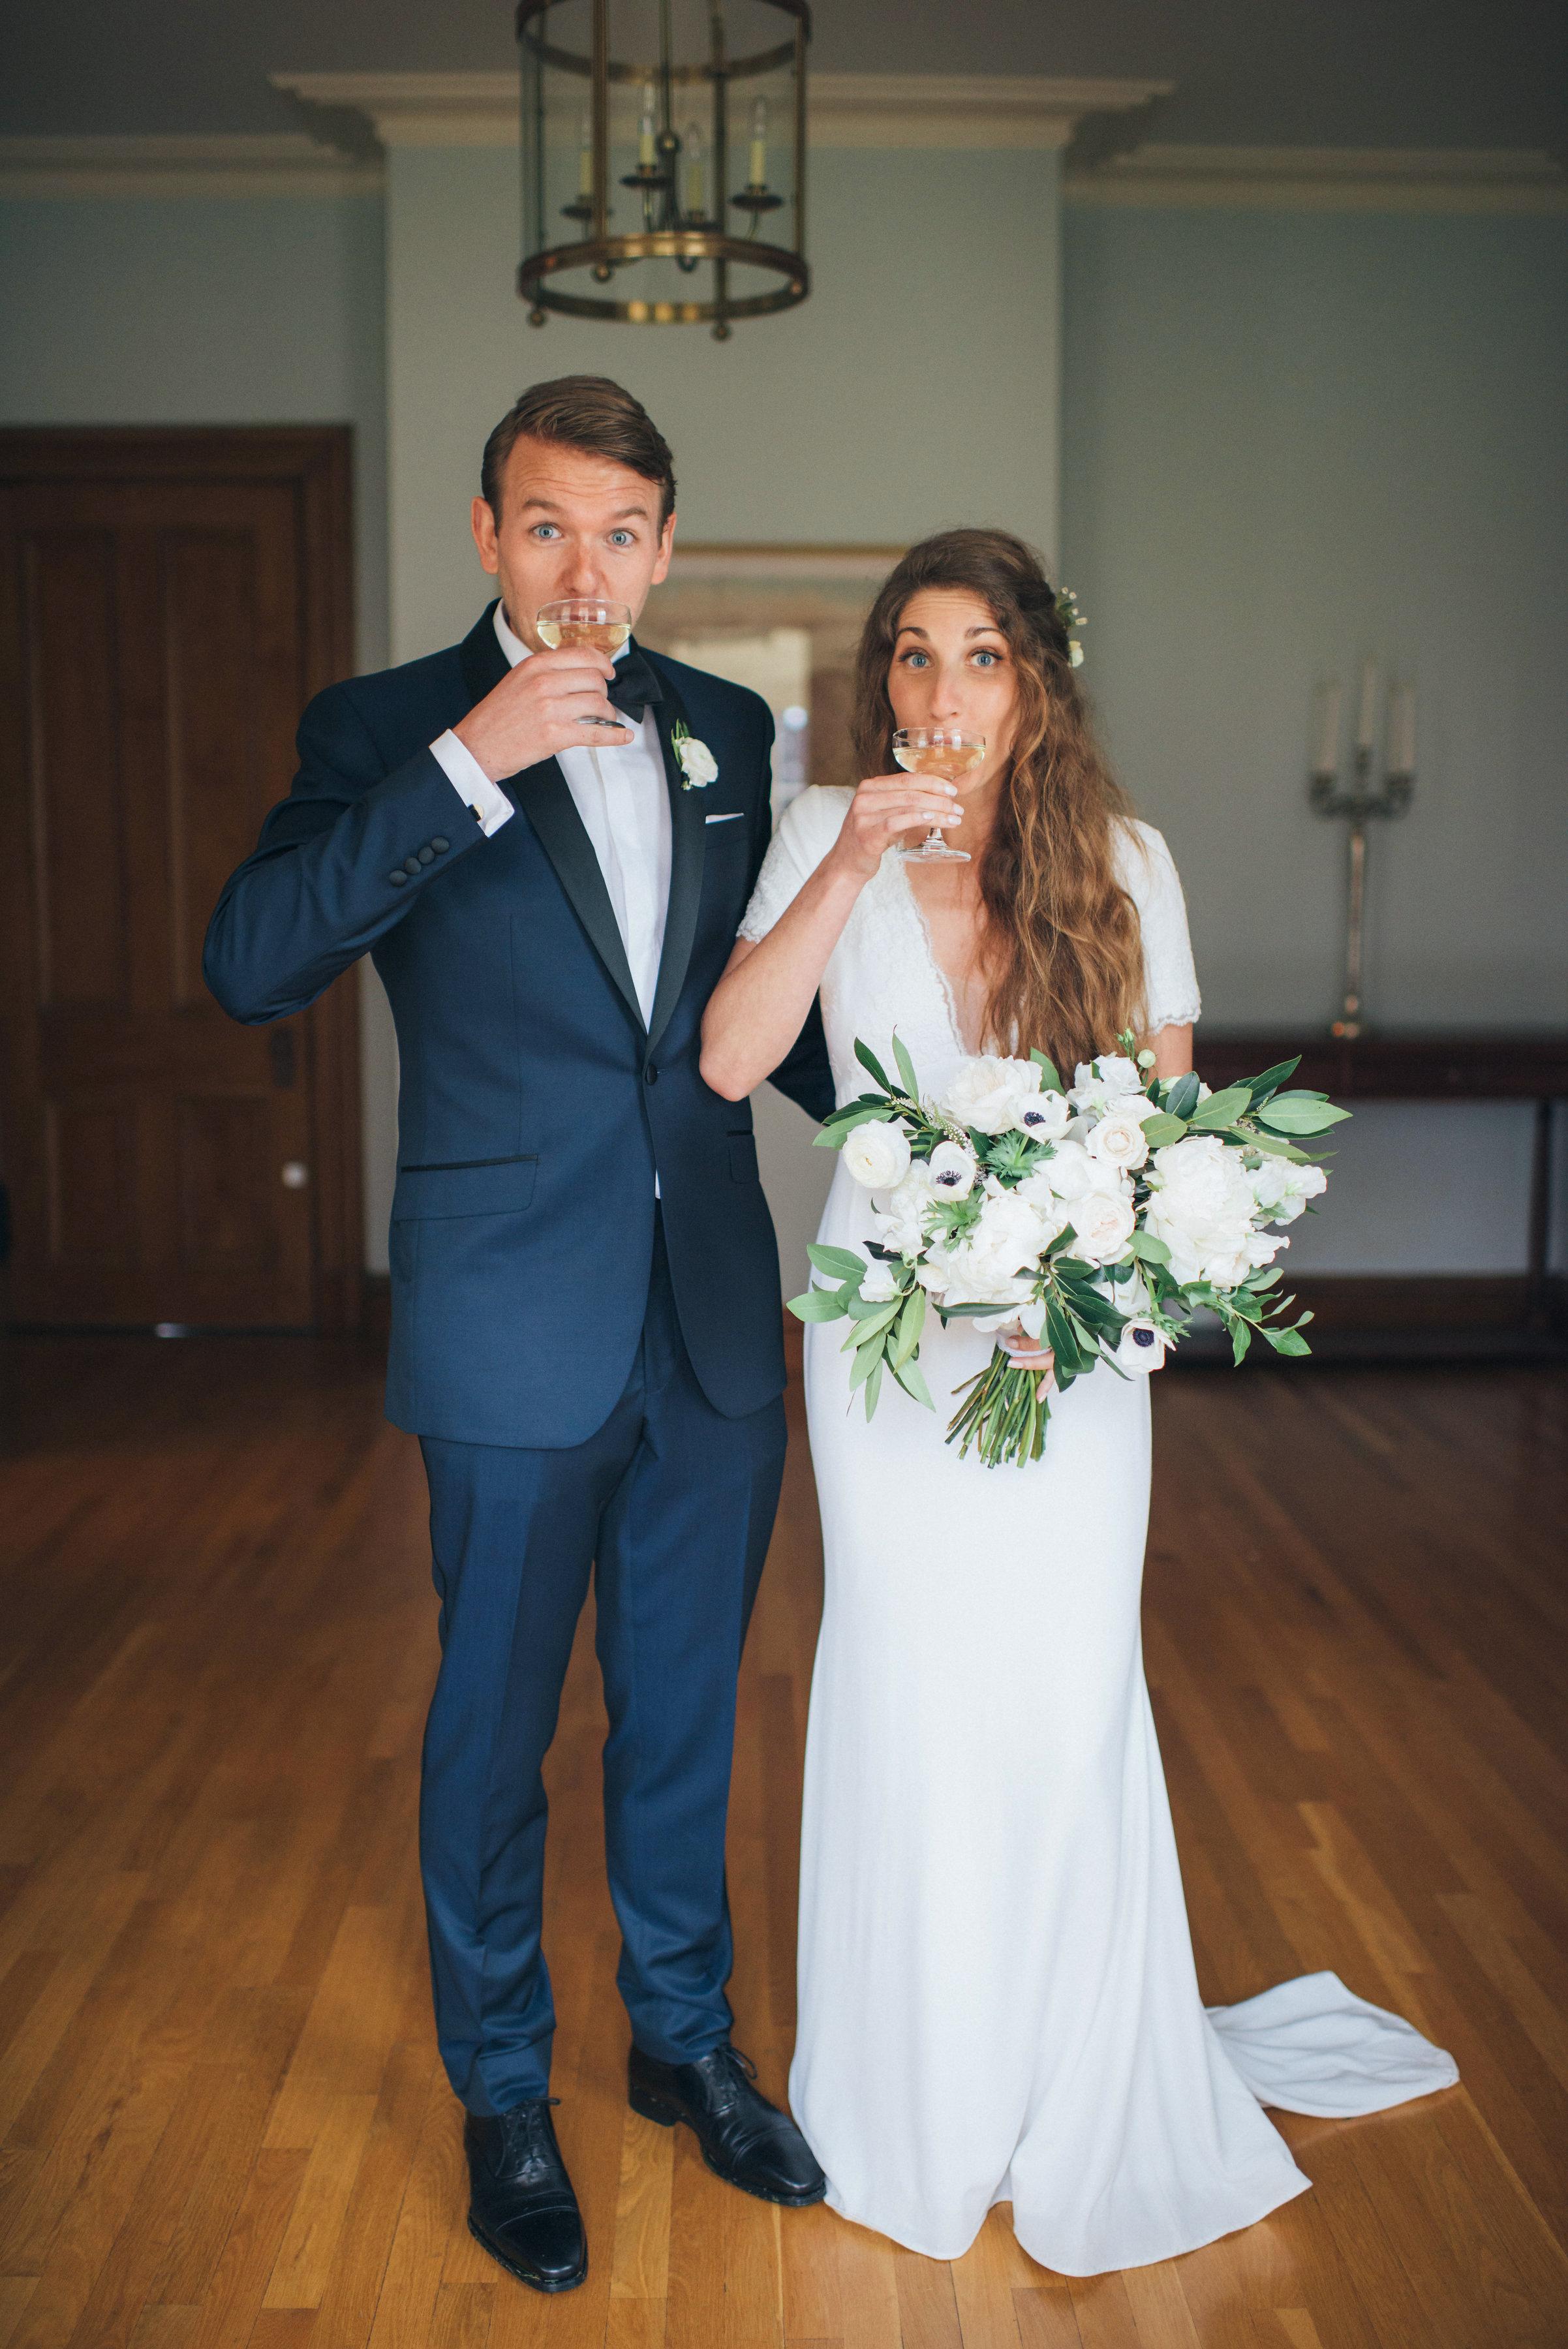 bride groom sip champagne in wedding attire